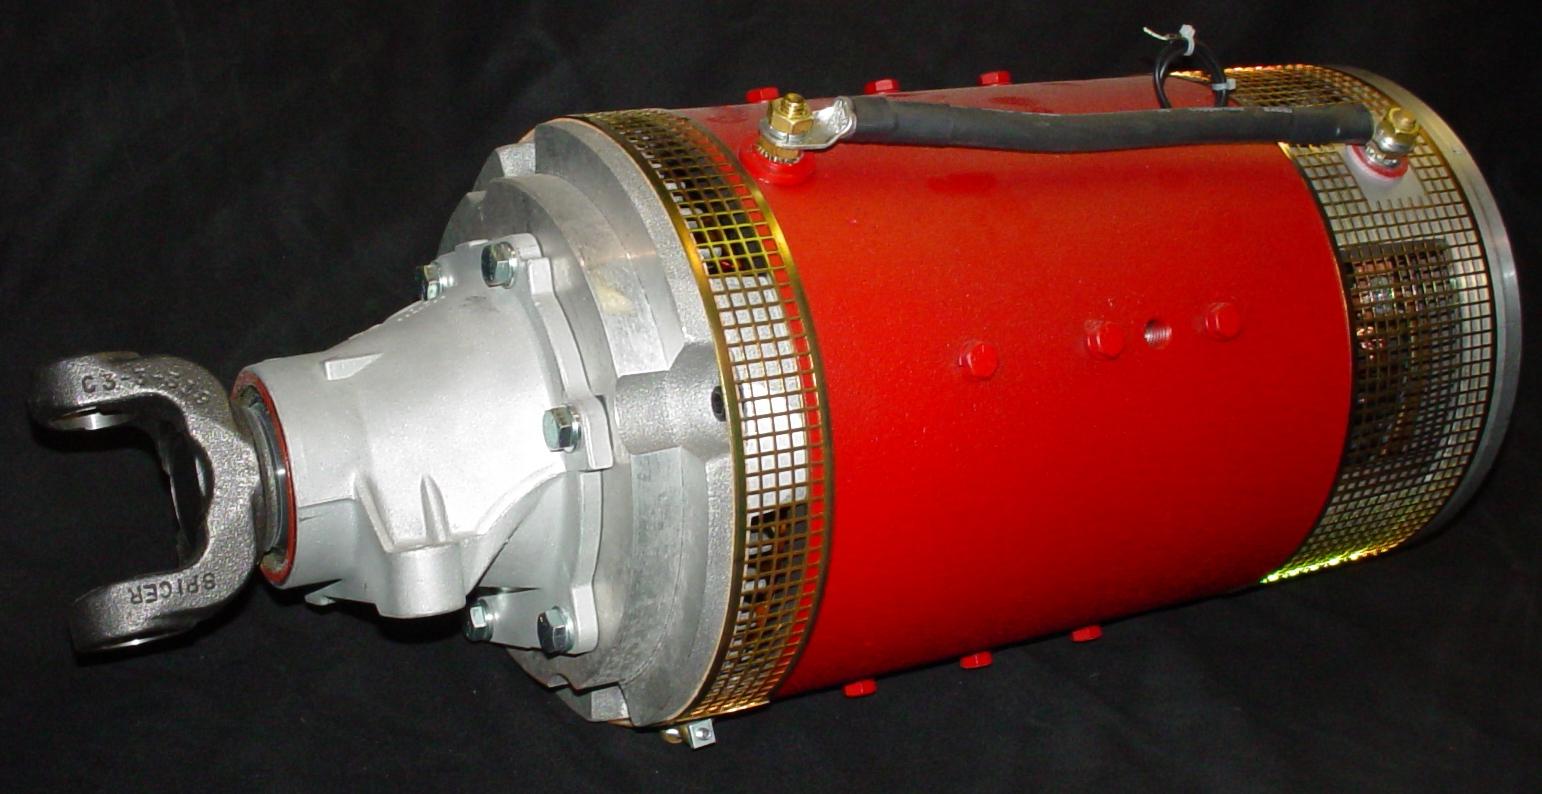 Smart fortwo el ctrico una conversi n de primera for Impulse 9 electric motor